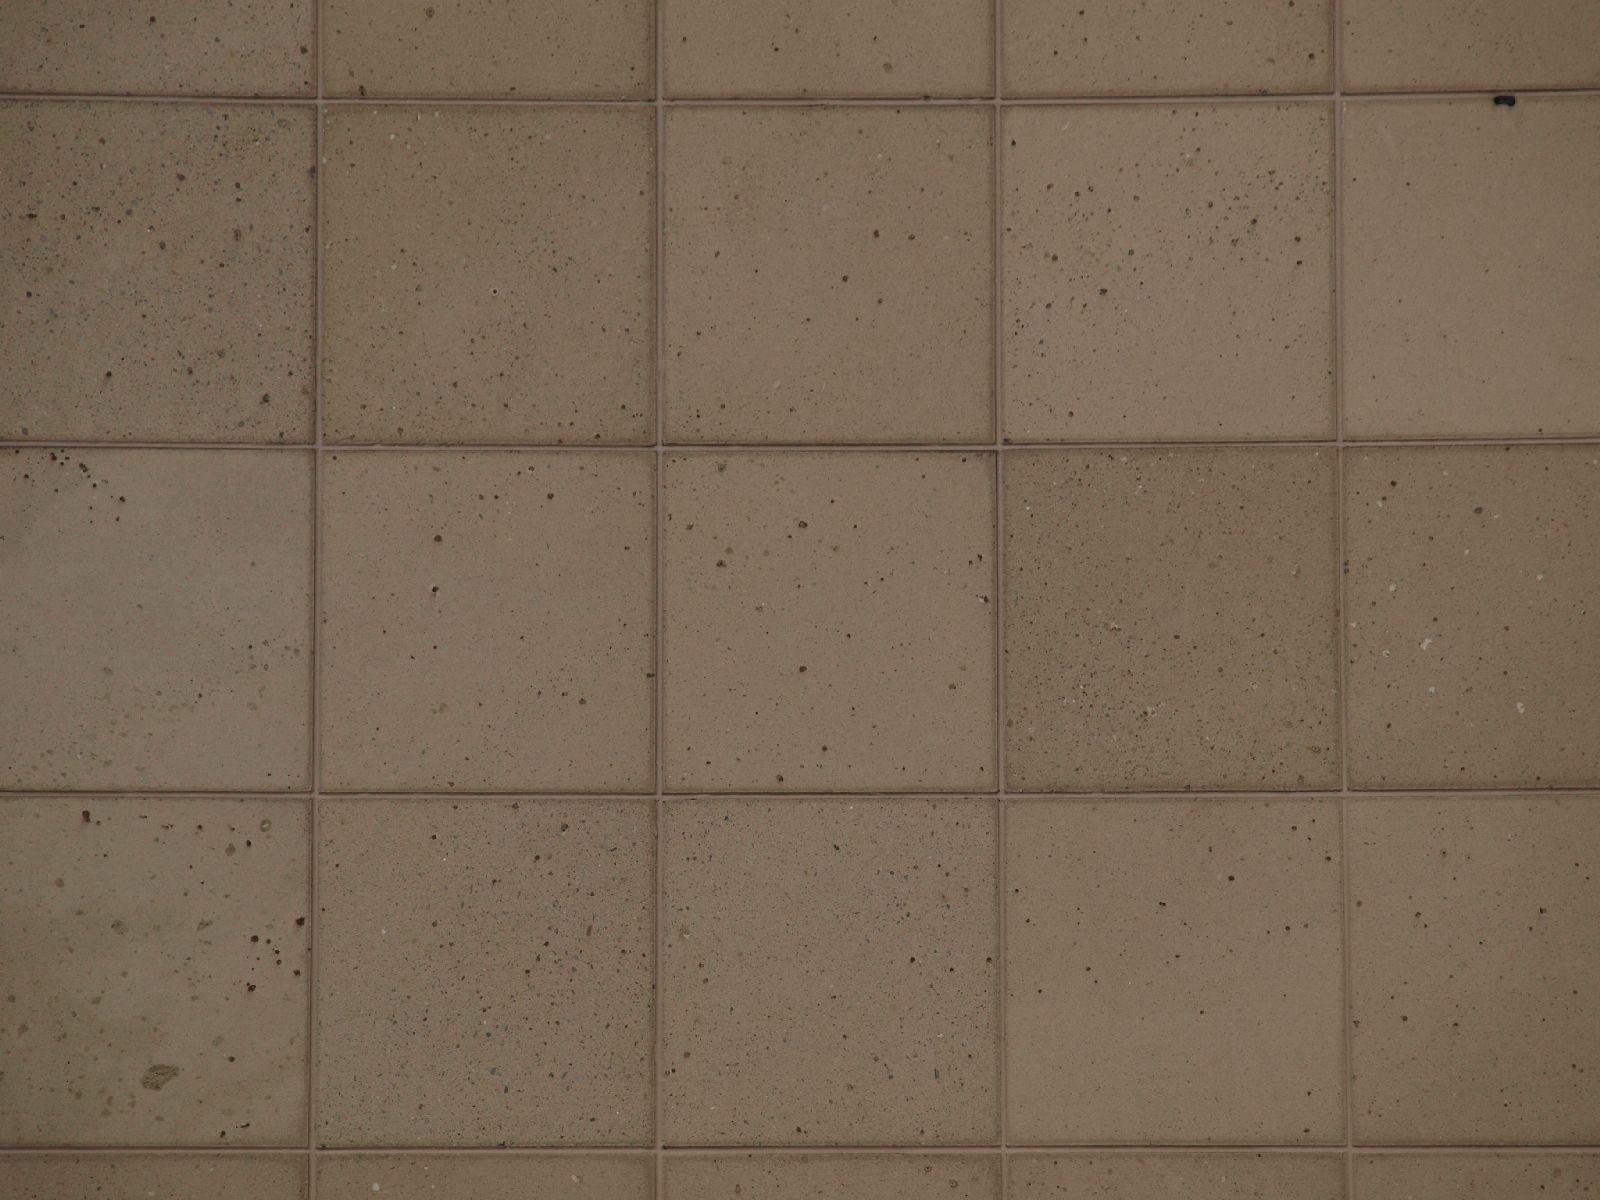 Brick_Texture_A_PB261276